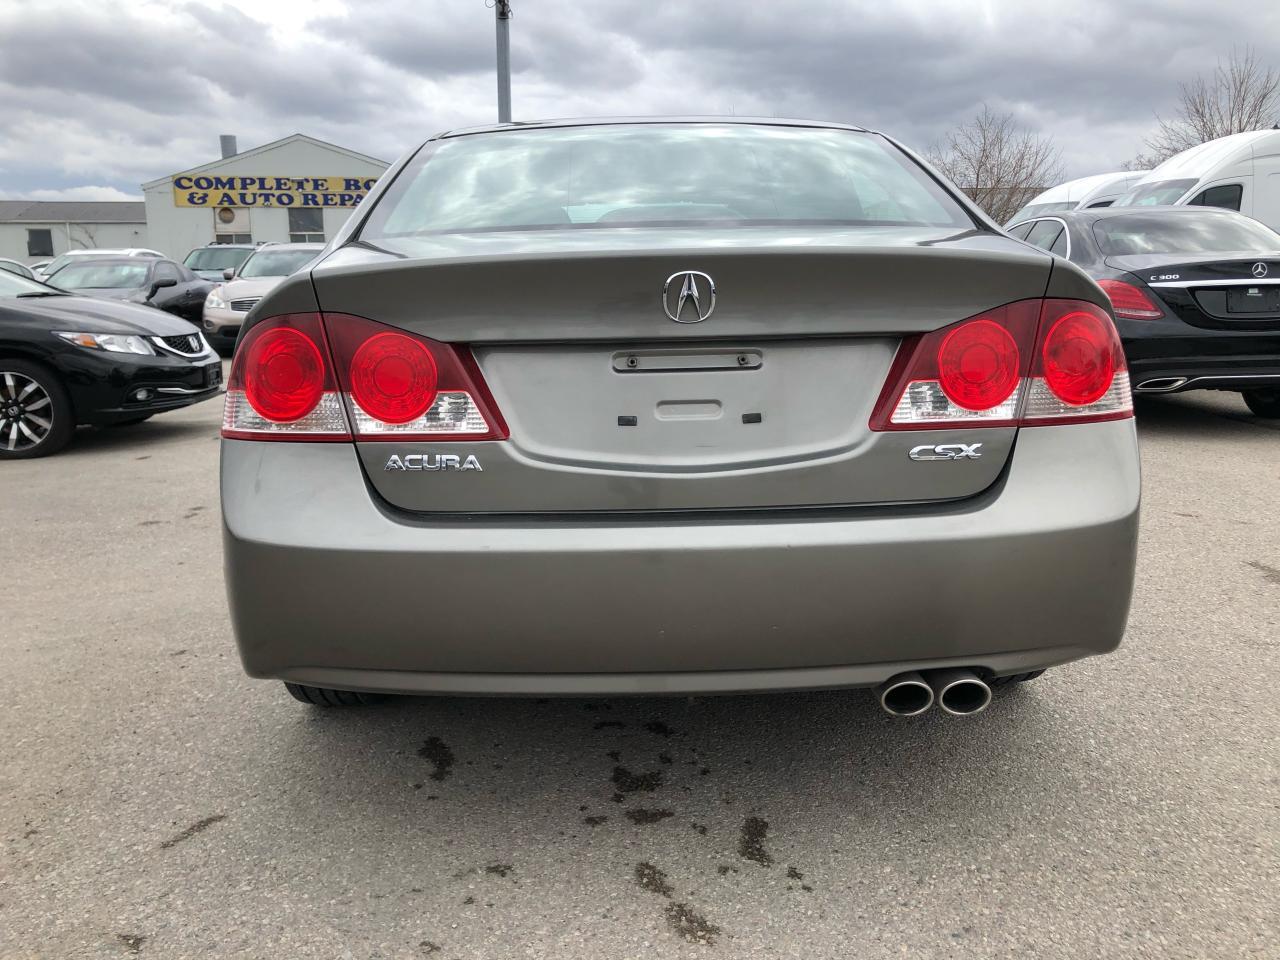 2008 Acura CSX